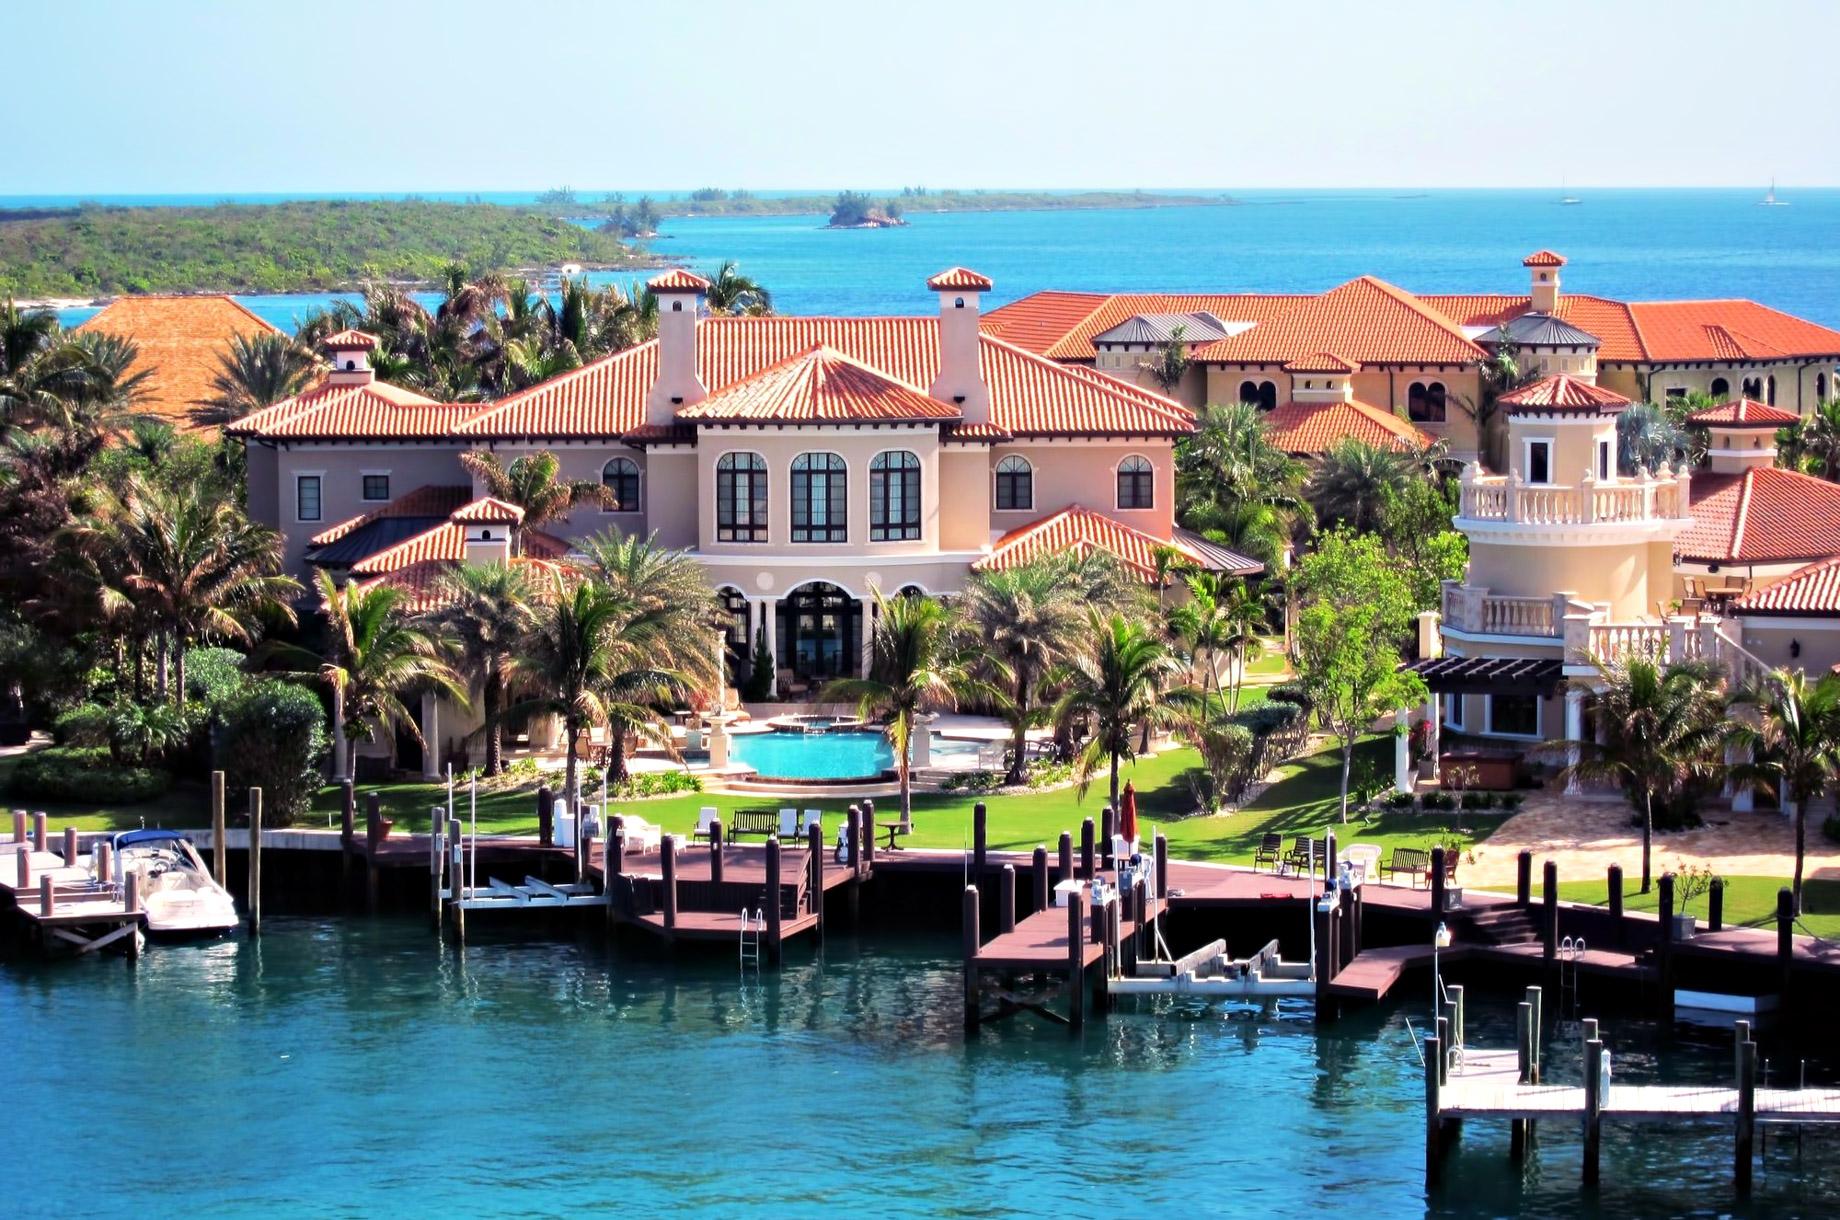 Villa Florentine - Paradise Island Bahamas